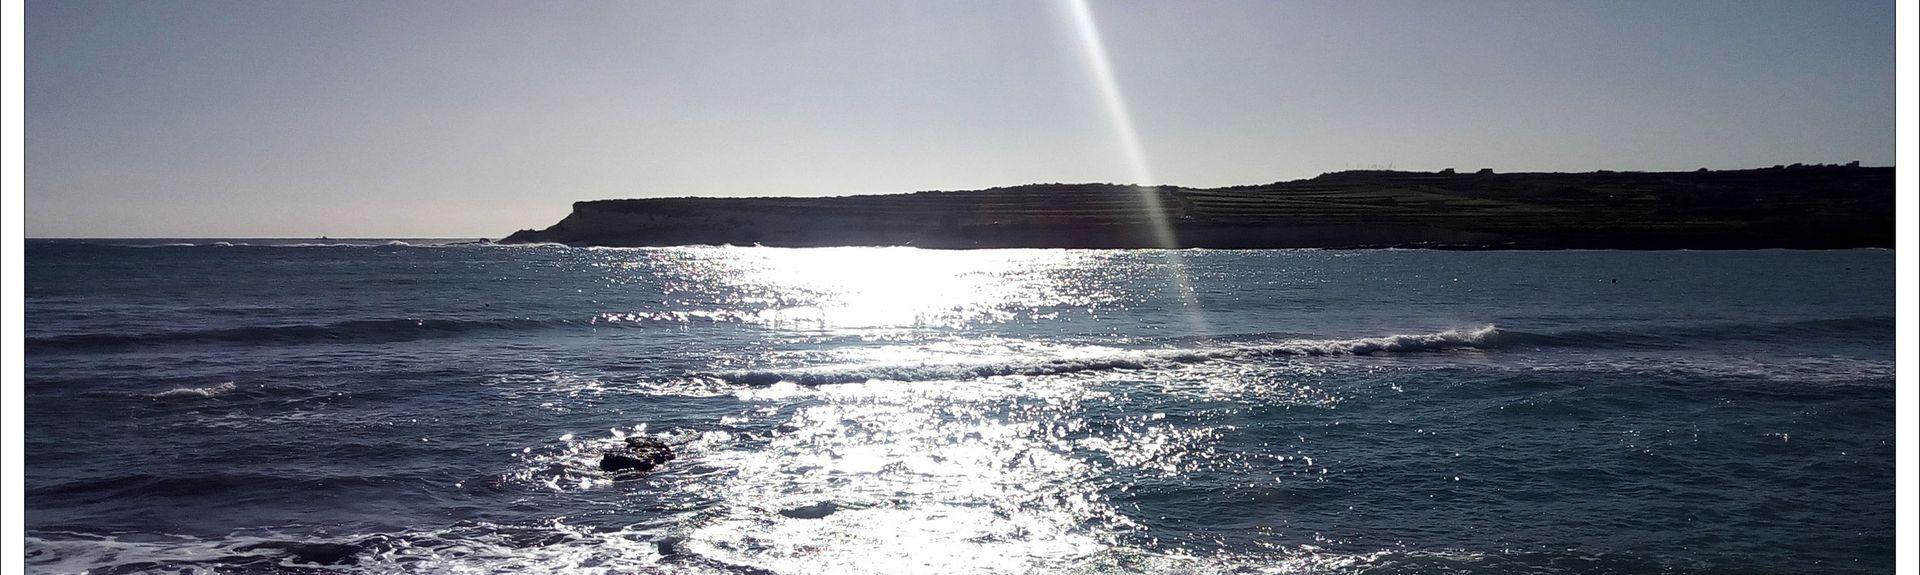 Luqa, Malte